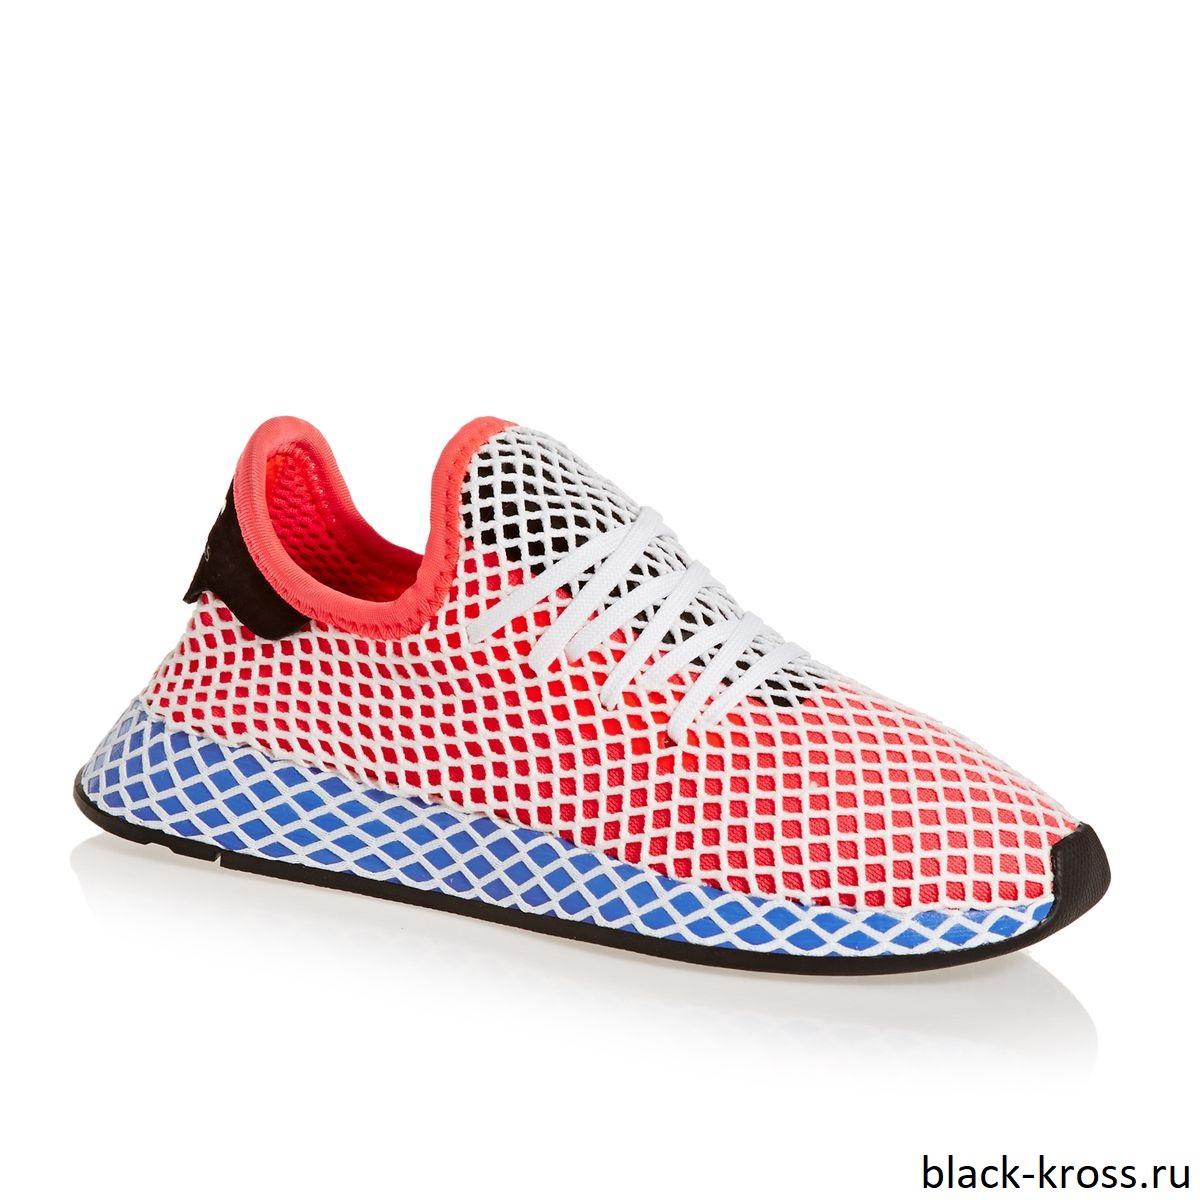 adidas-originals-shoes-adidas-originals-deerupt-runner-j-shoes-solar-red-solar-red-bluebird